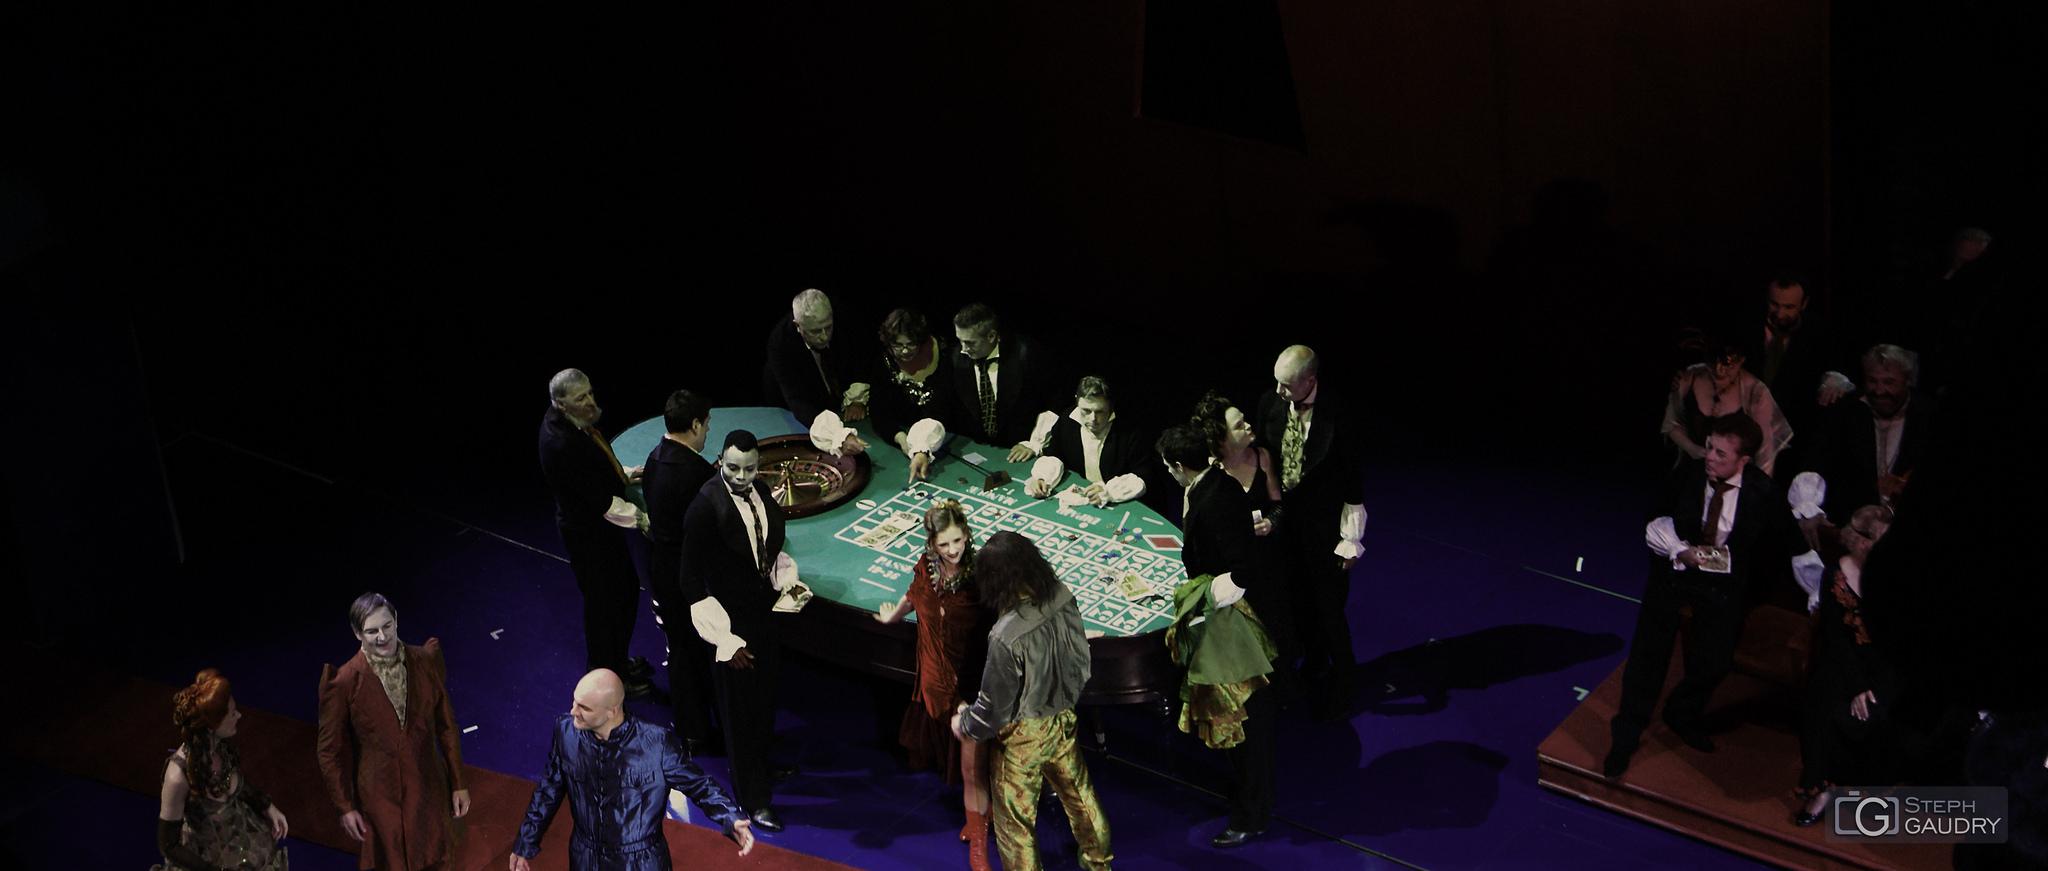 La traviata -  Libiamo ne' lieti calici [Click to start slideshow]